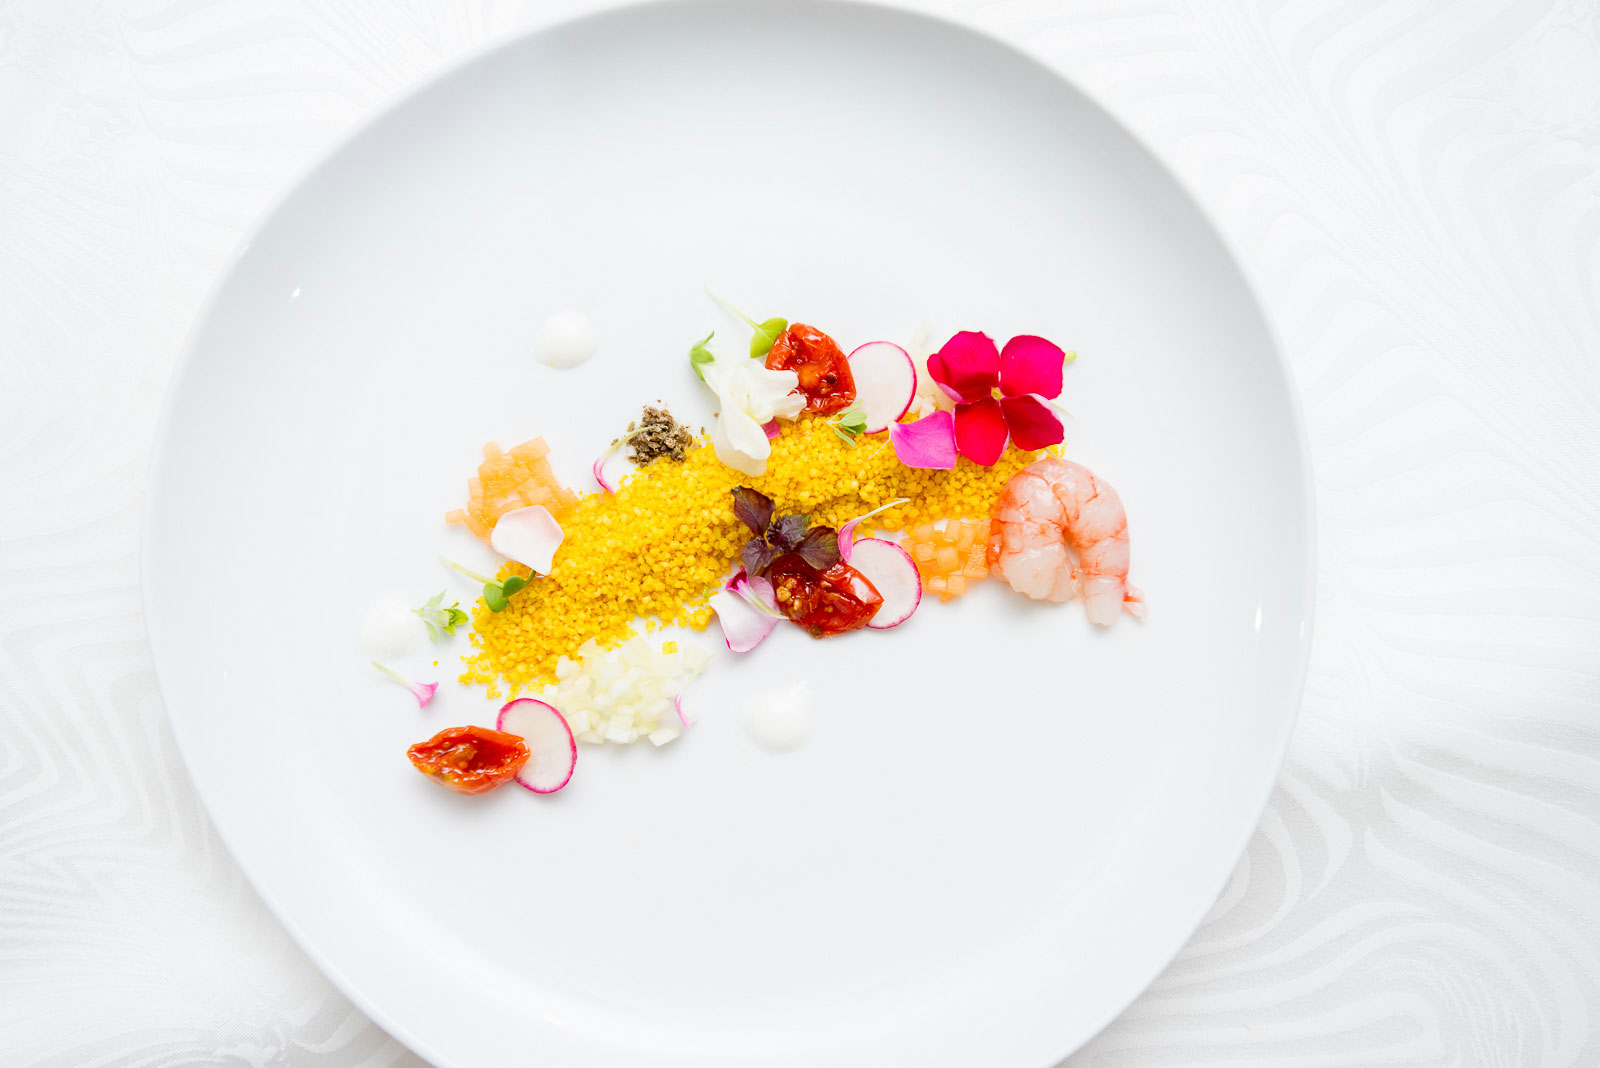 https://www.orlandinifrancesco.com/wp/wp-content/uploads/2019/02/Parco-Dei-Principi-Piatti-Gourmet-7.jpg